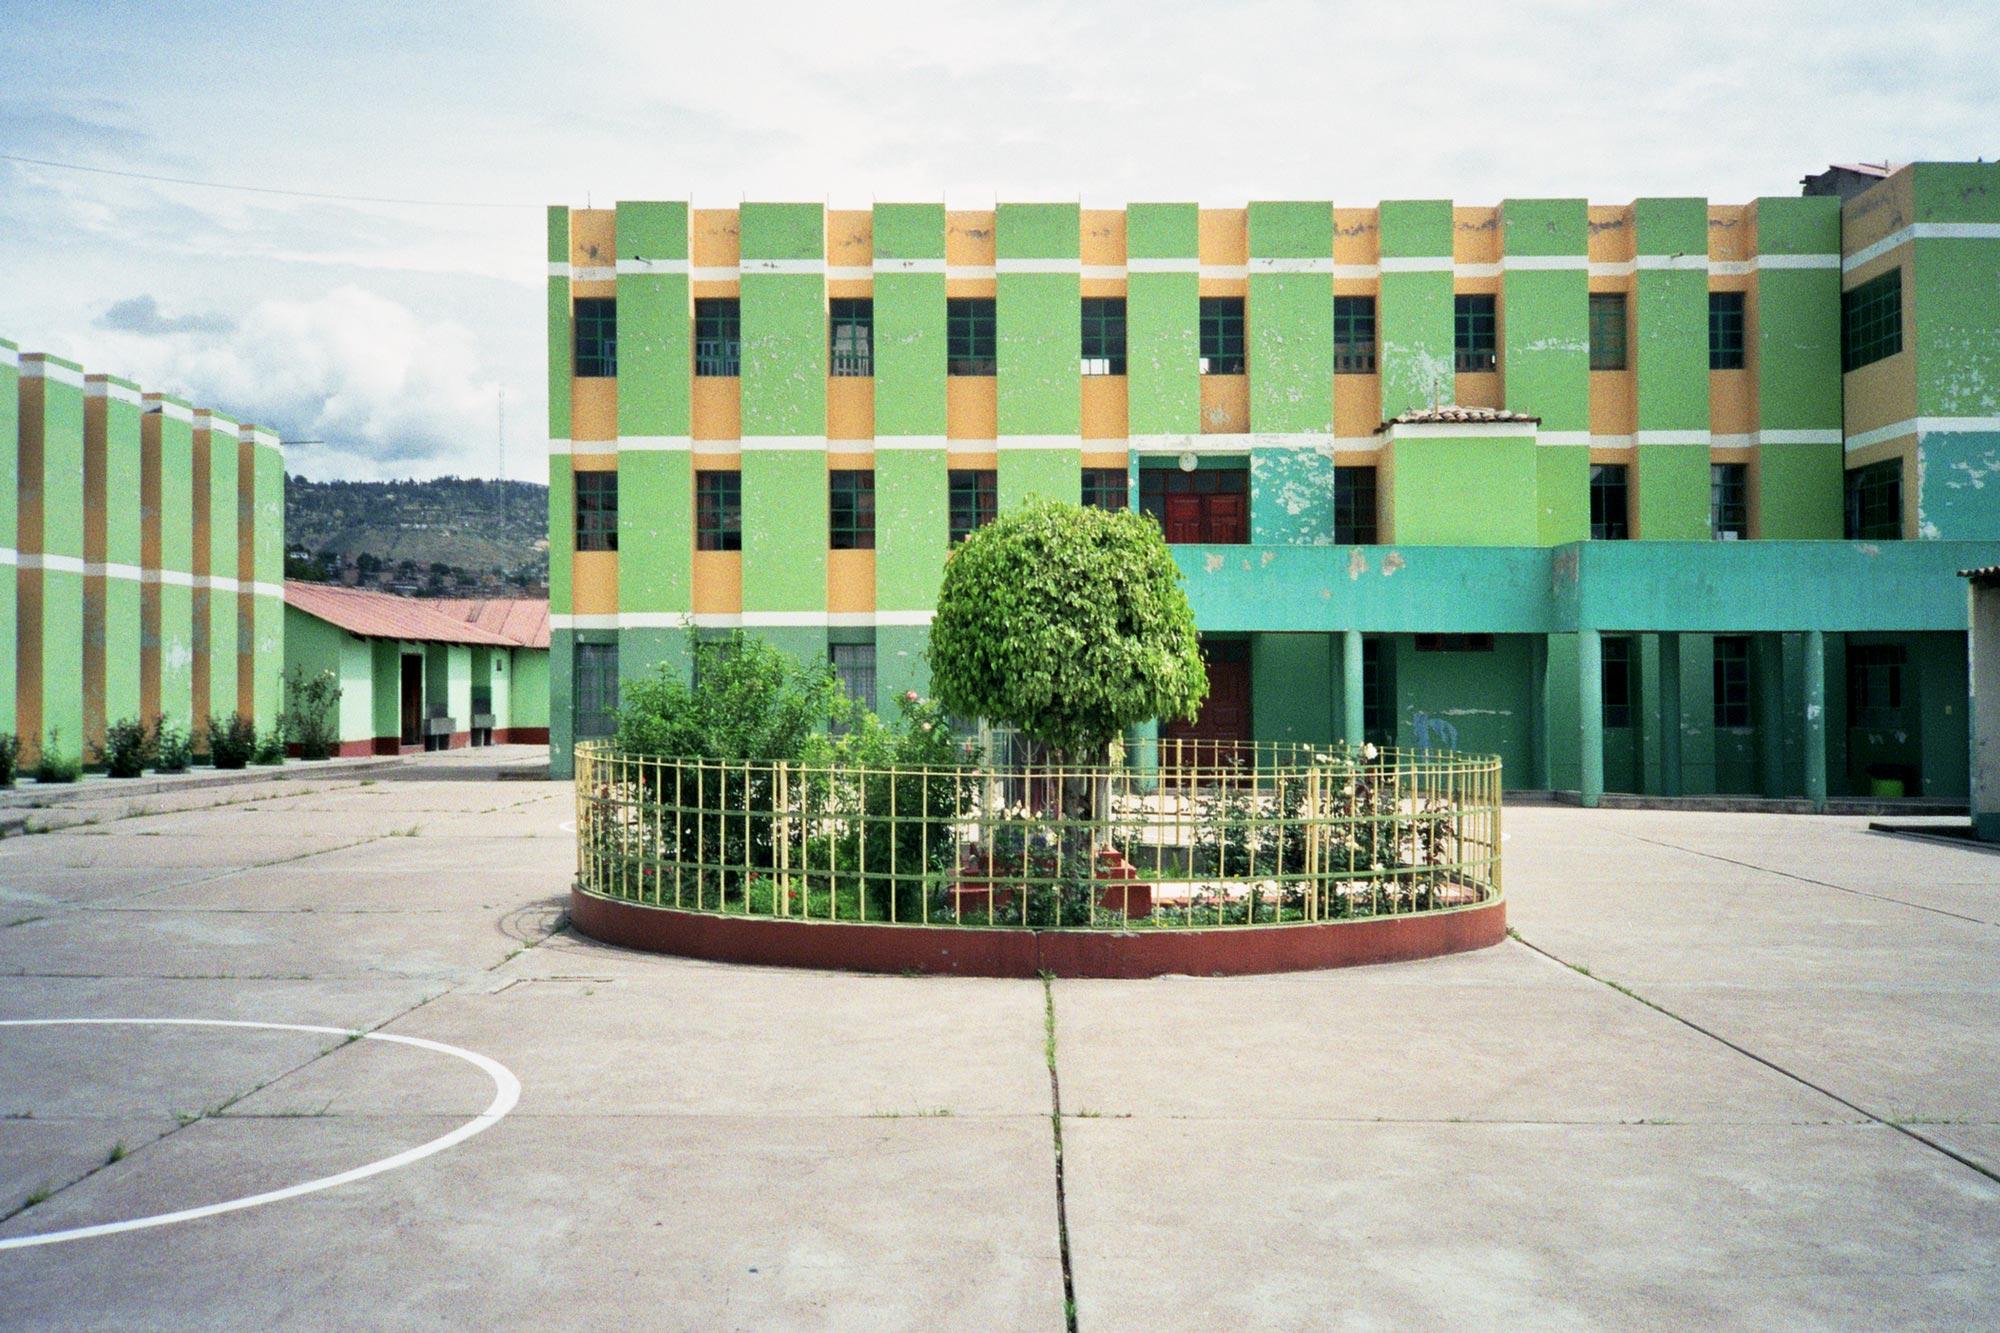 Peru Ayacucho Puericultorio central square